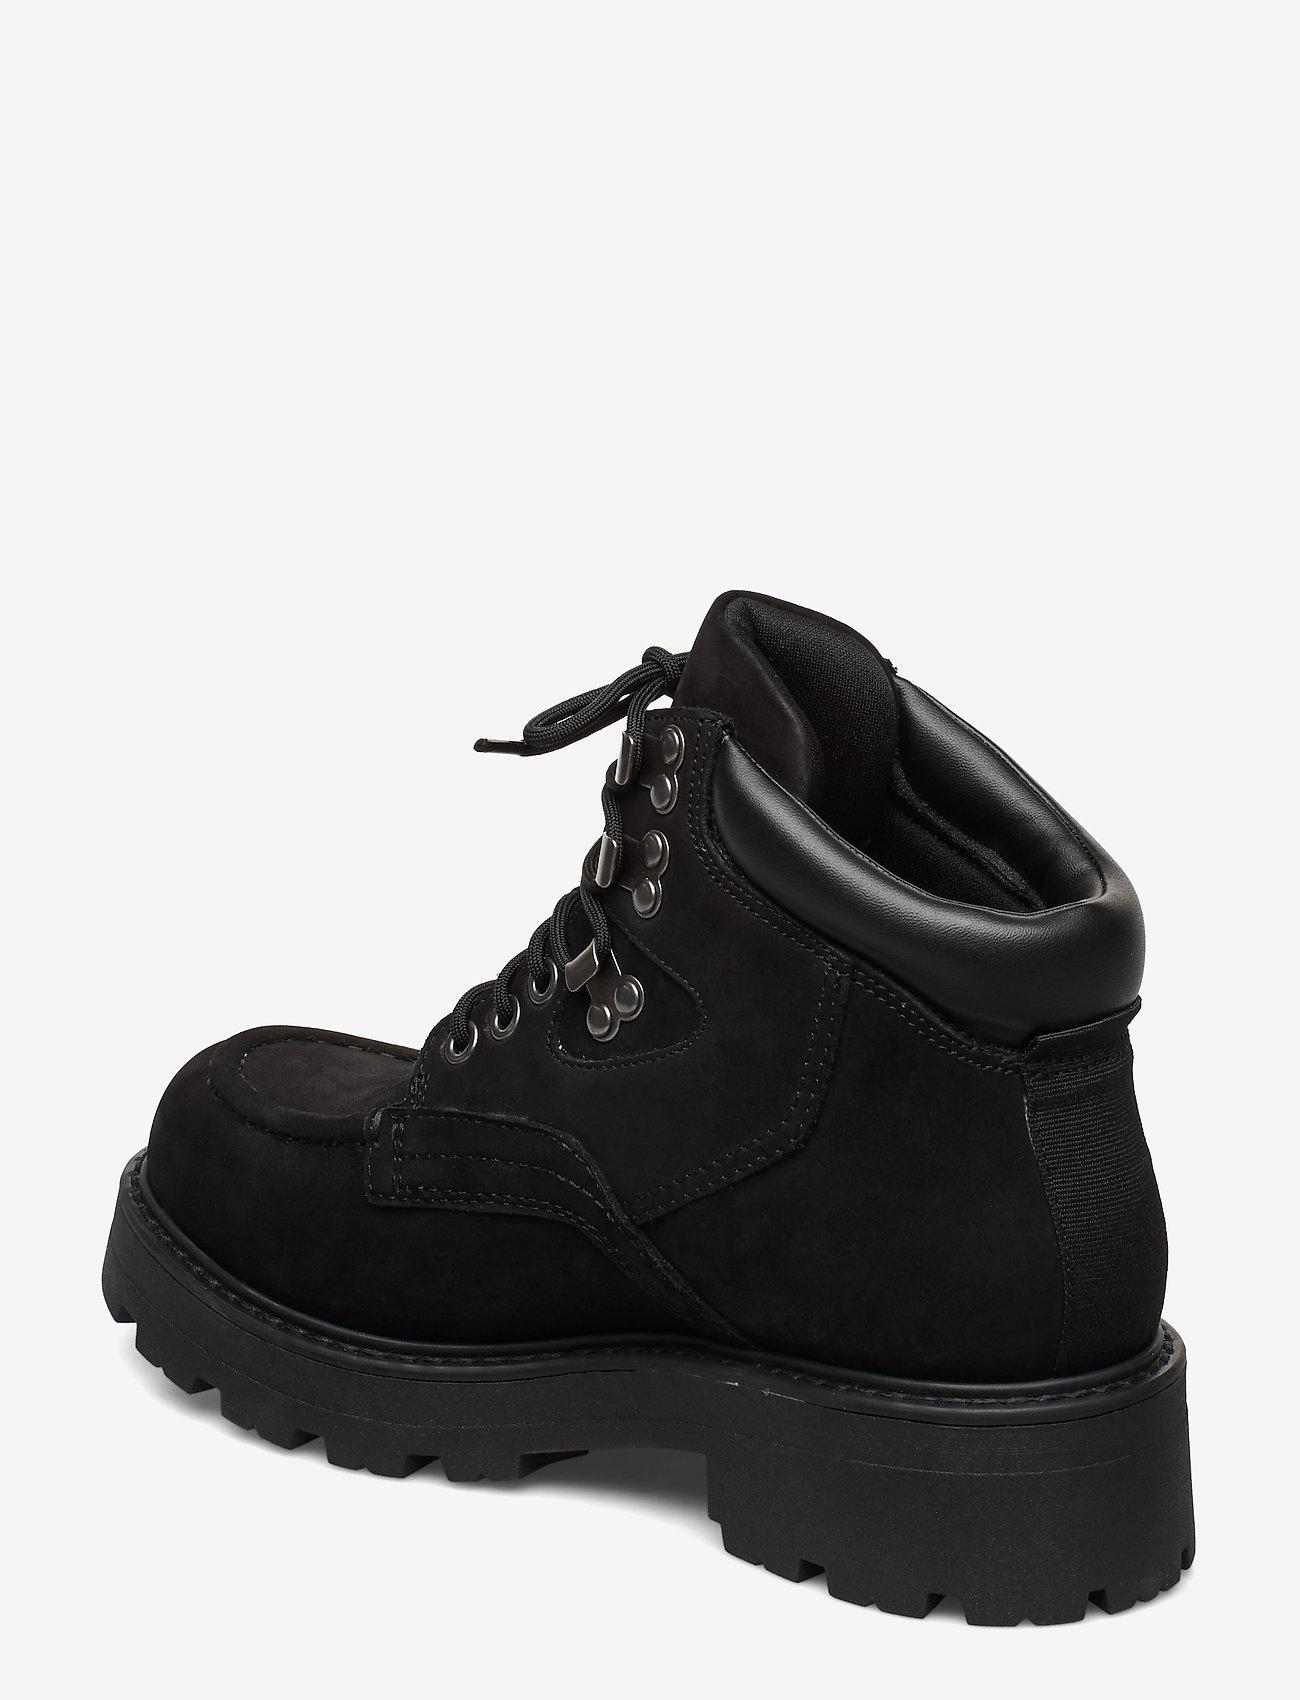 Cosmo 2.0 (Black) (659.40 kr) - VAGABOND